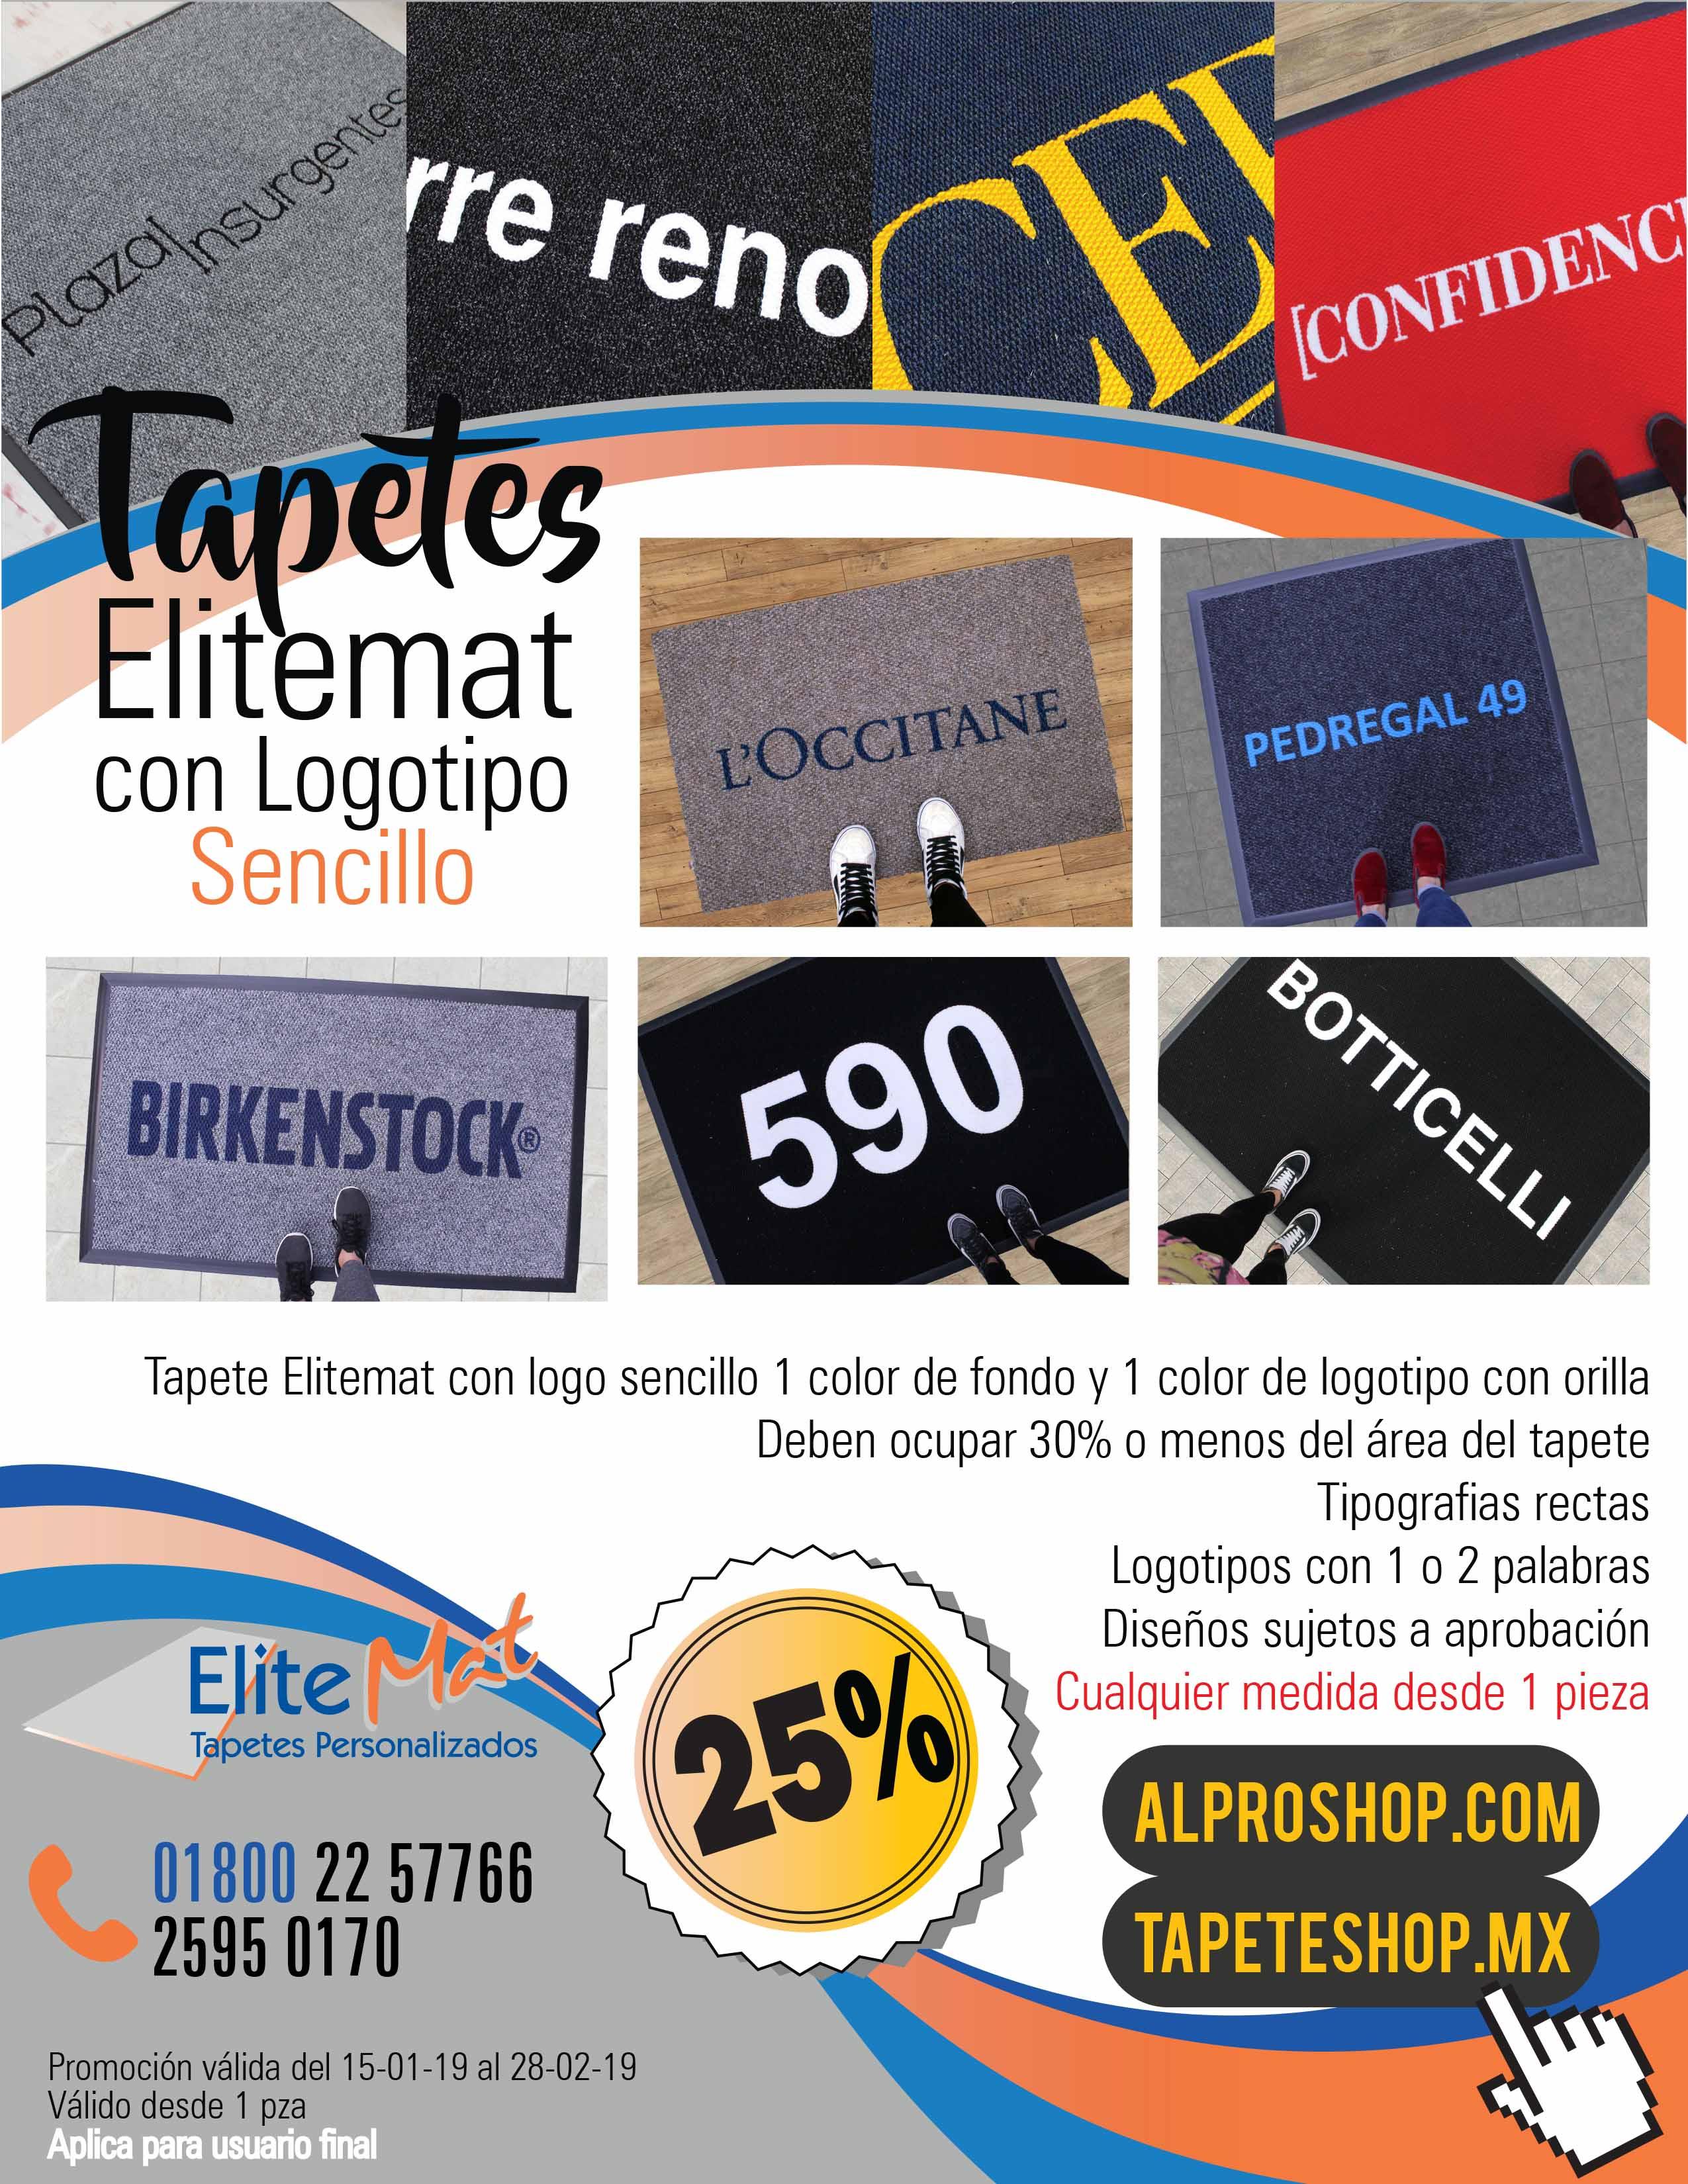 elitemat-con-logo-sencillo-usuario.jpg